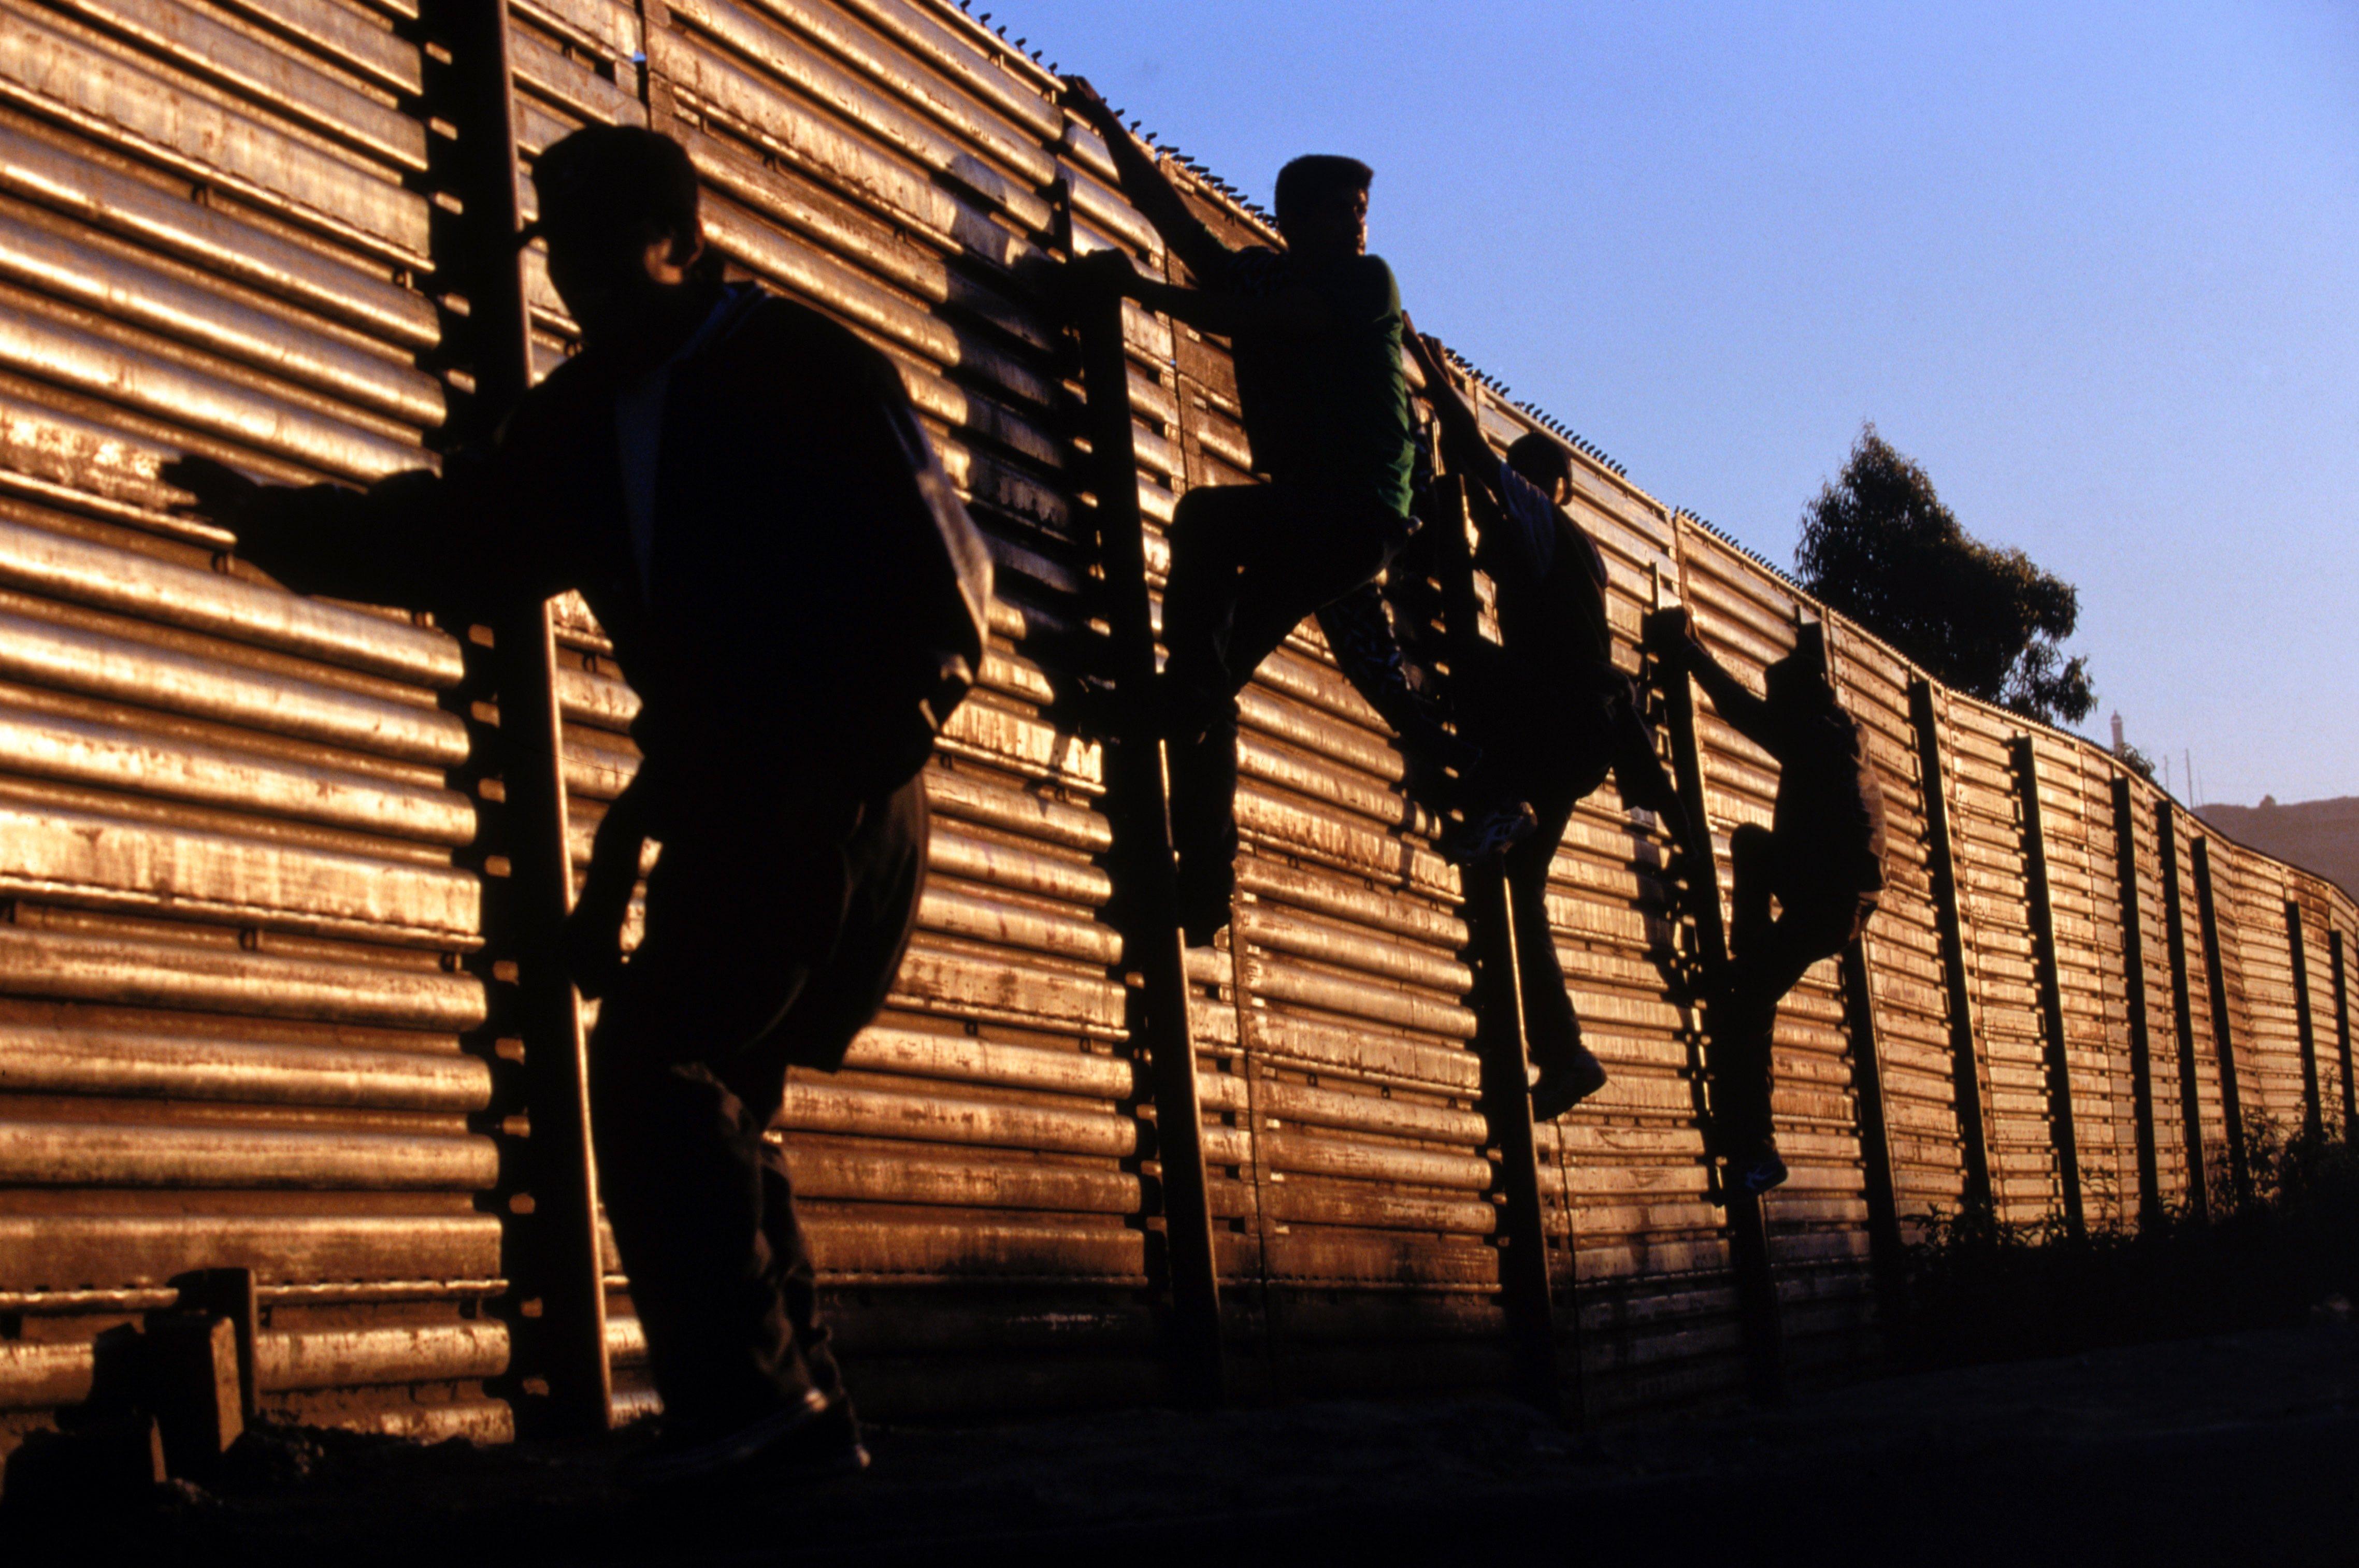 crossing border, teachers, background screening, background checks